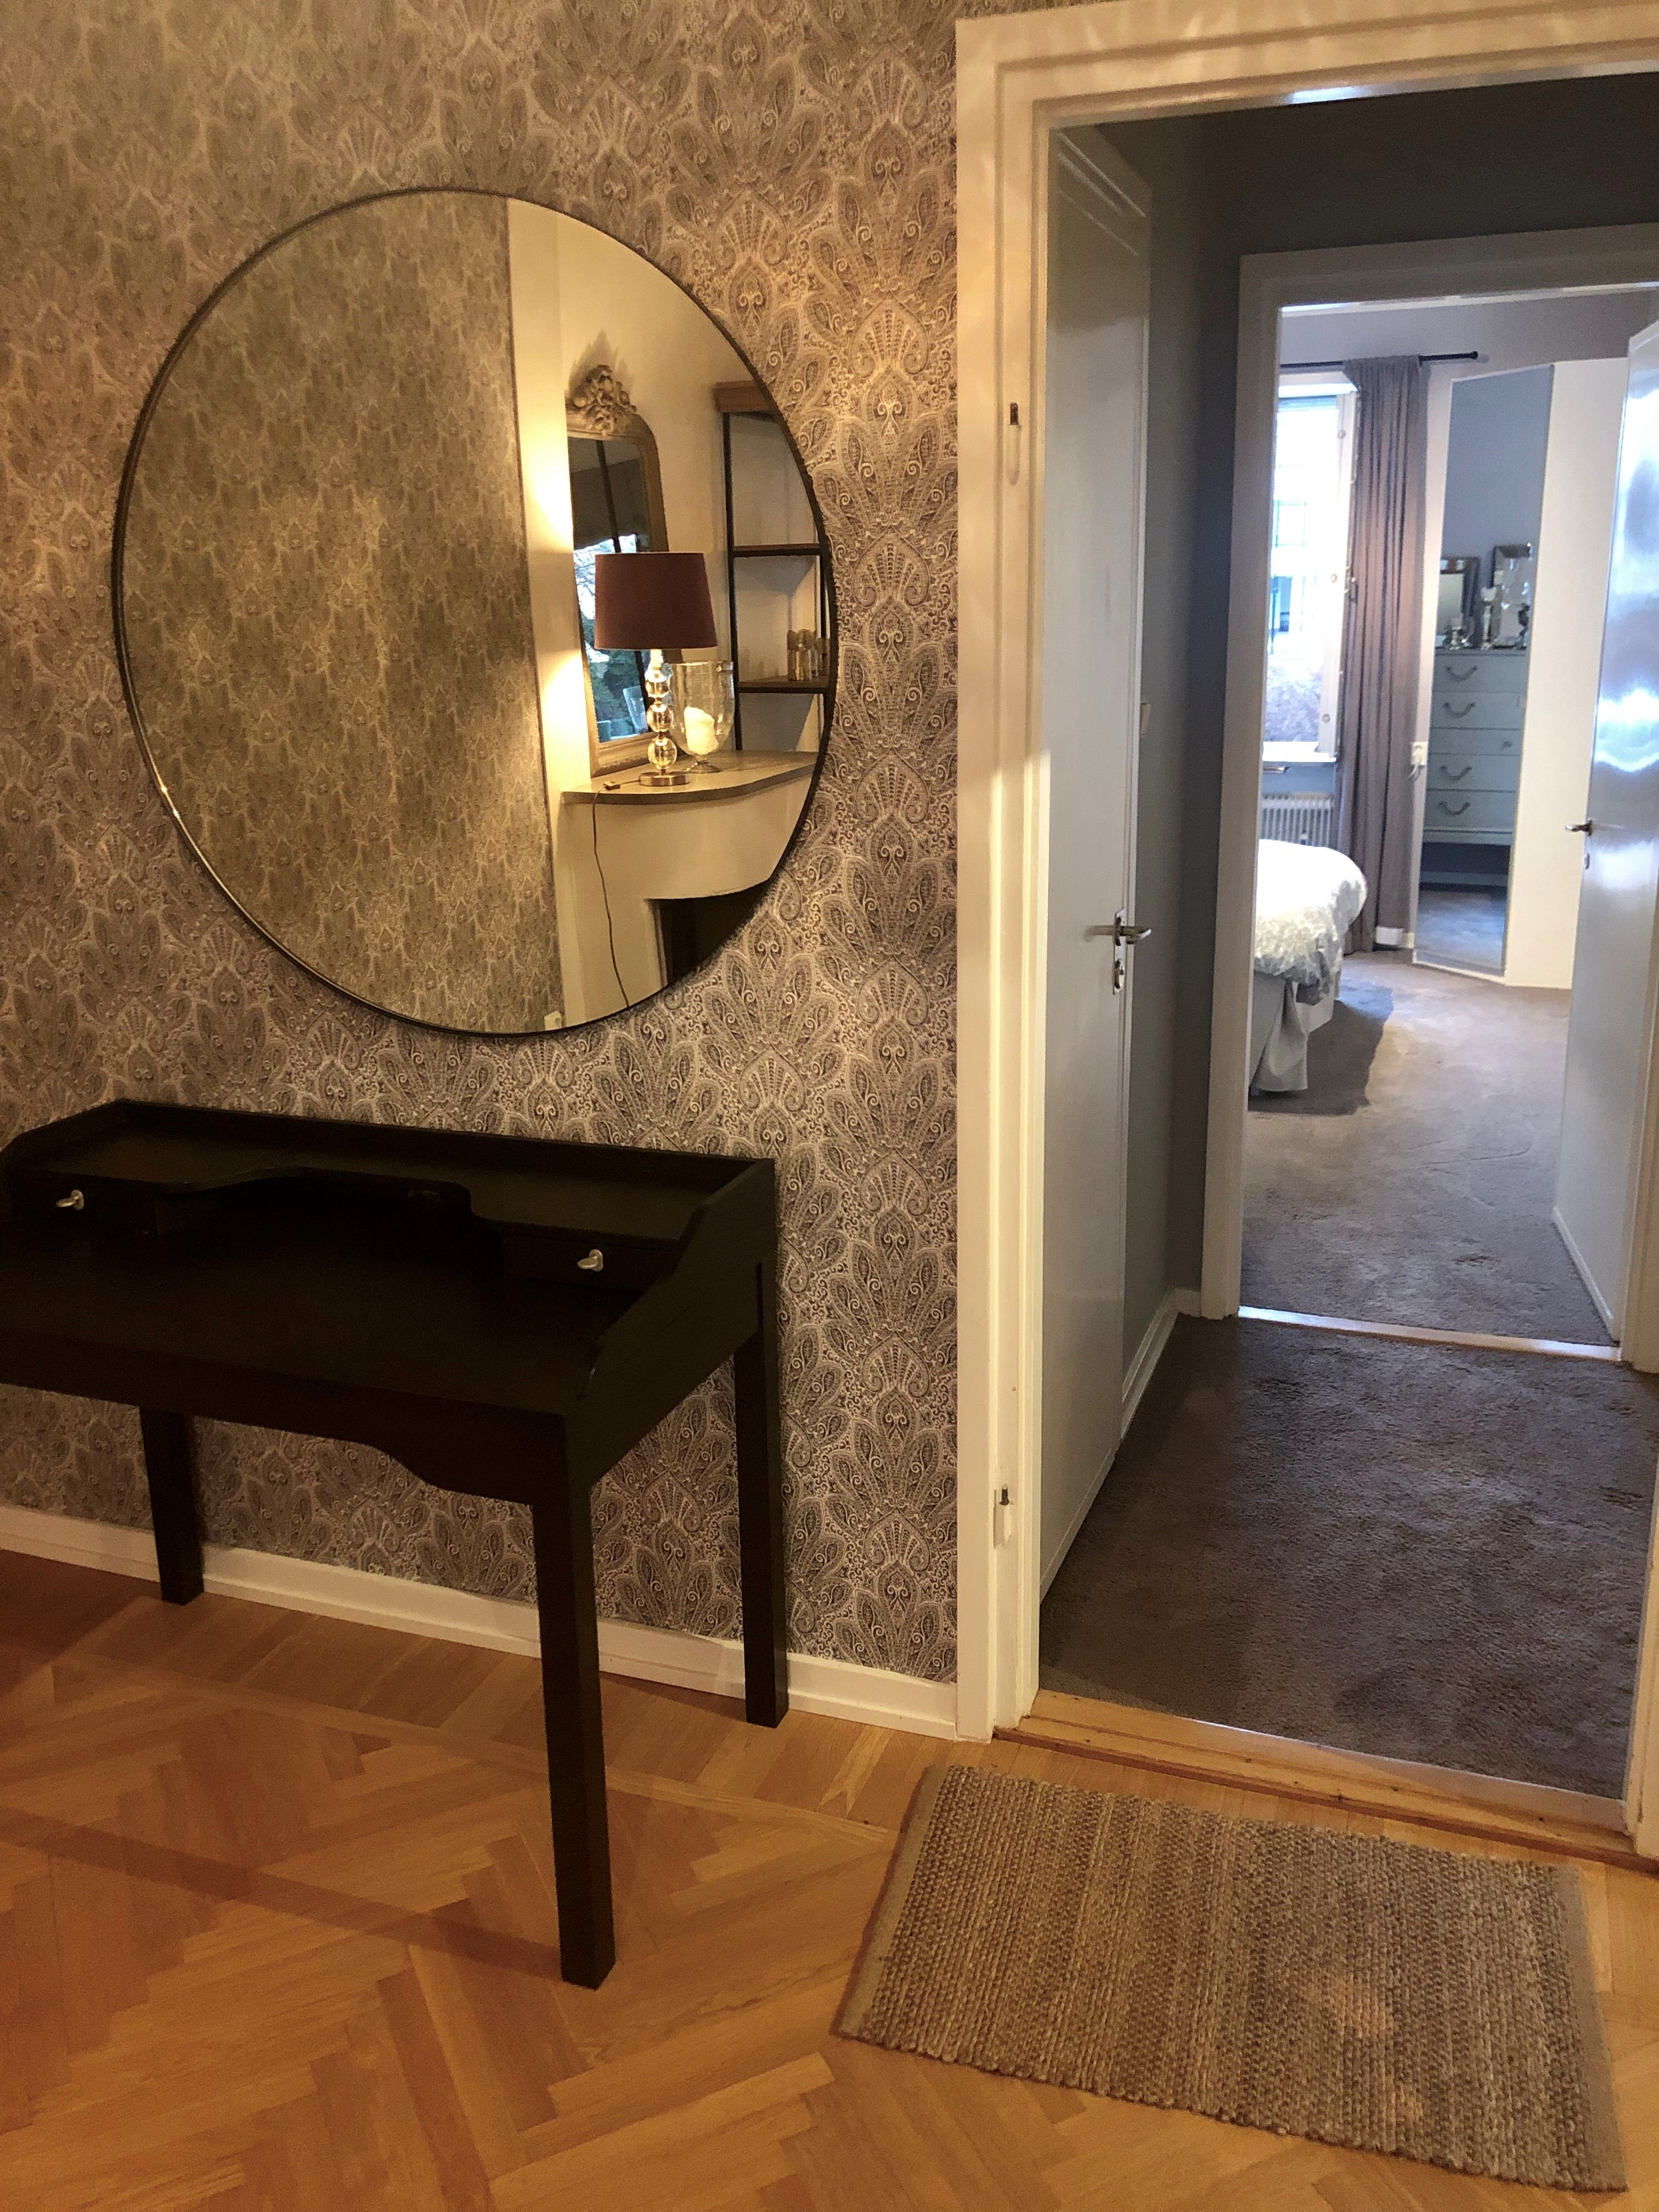 Corporate apartments rent Newstay, Blanchegatan 16, Gärdet